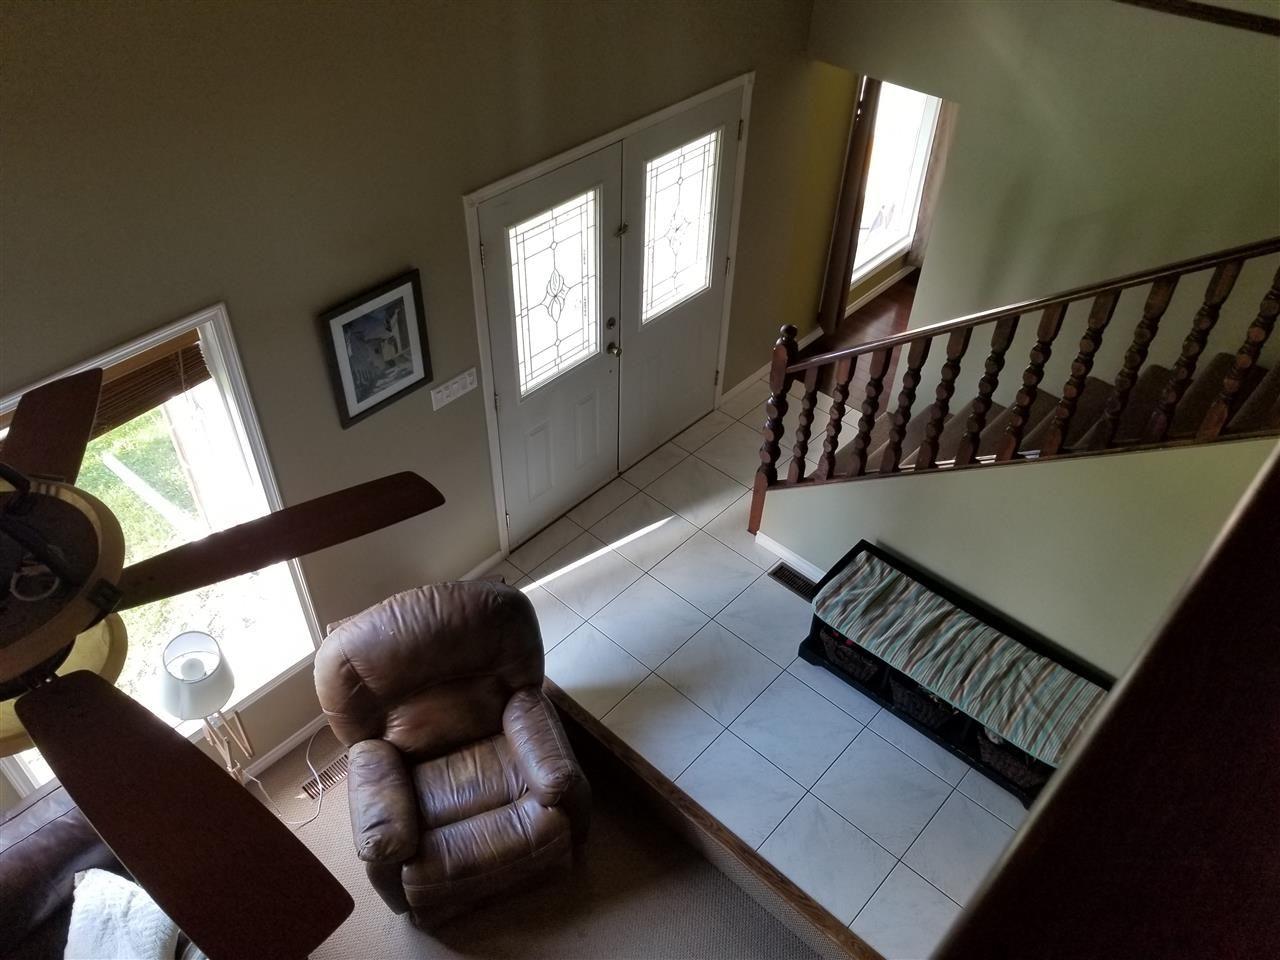 Photo 21: Photos: 511 TAMARACK Road in Williams Lake: Esler/Dog Creek House for sale (Williams Lake (Zone 27))  : MLS®# R2487403